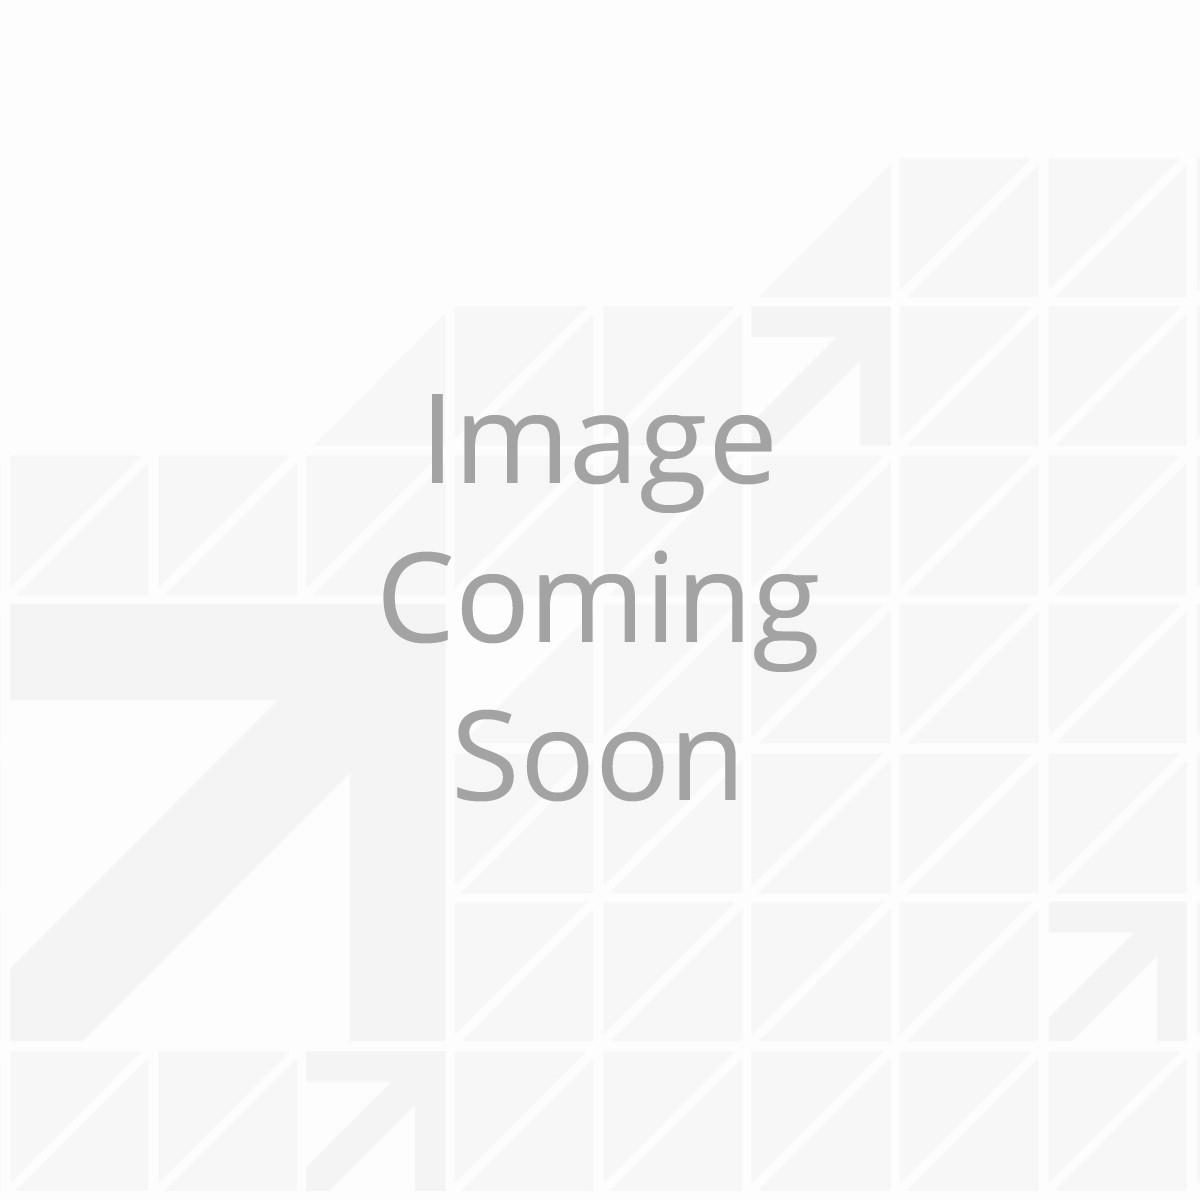 Jack, 16K Spring Return - 16 TS, 15WS (500385TH)